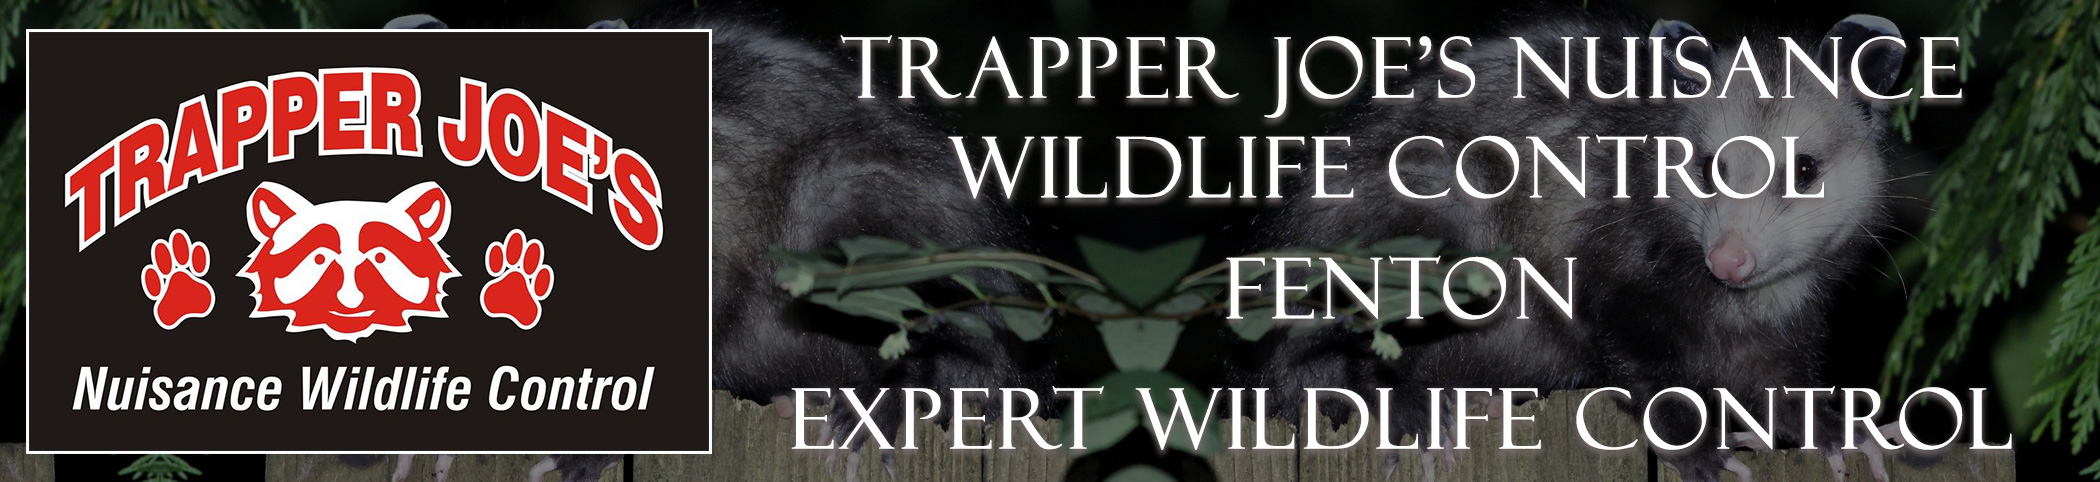 Trapper Joes Fenton Missouri header image